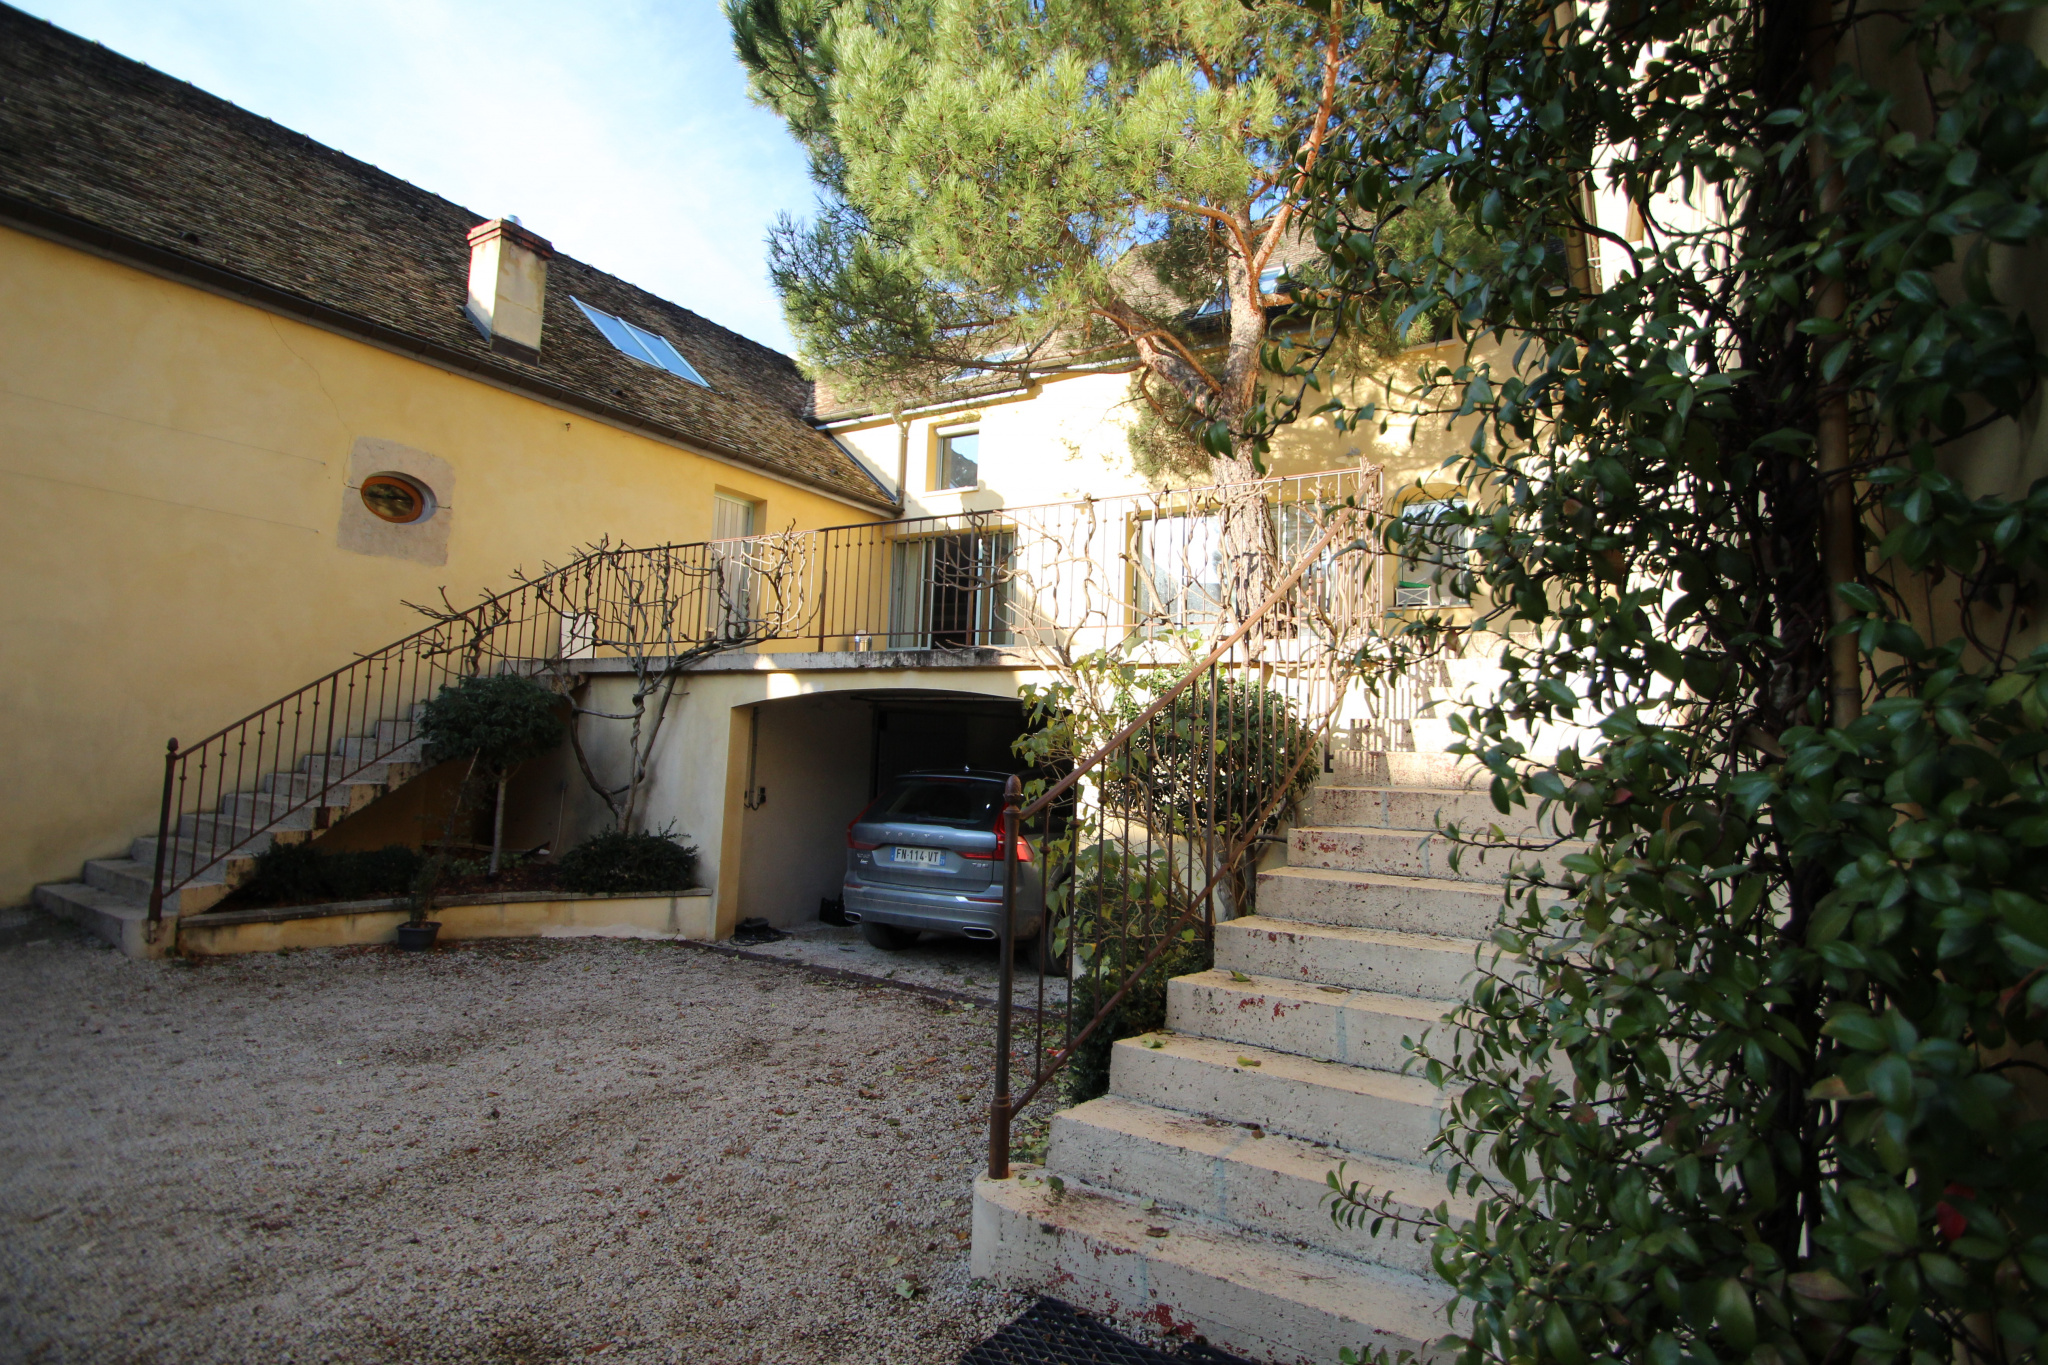 Vente maison/villa st romain transco